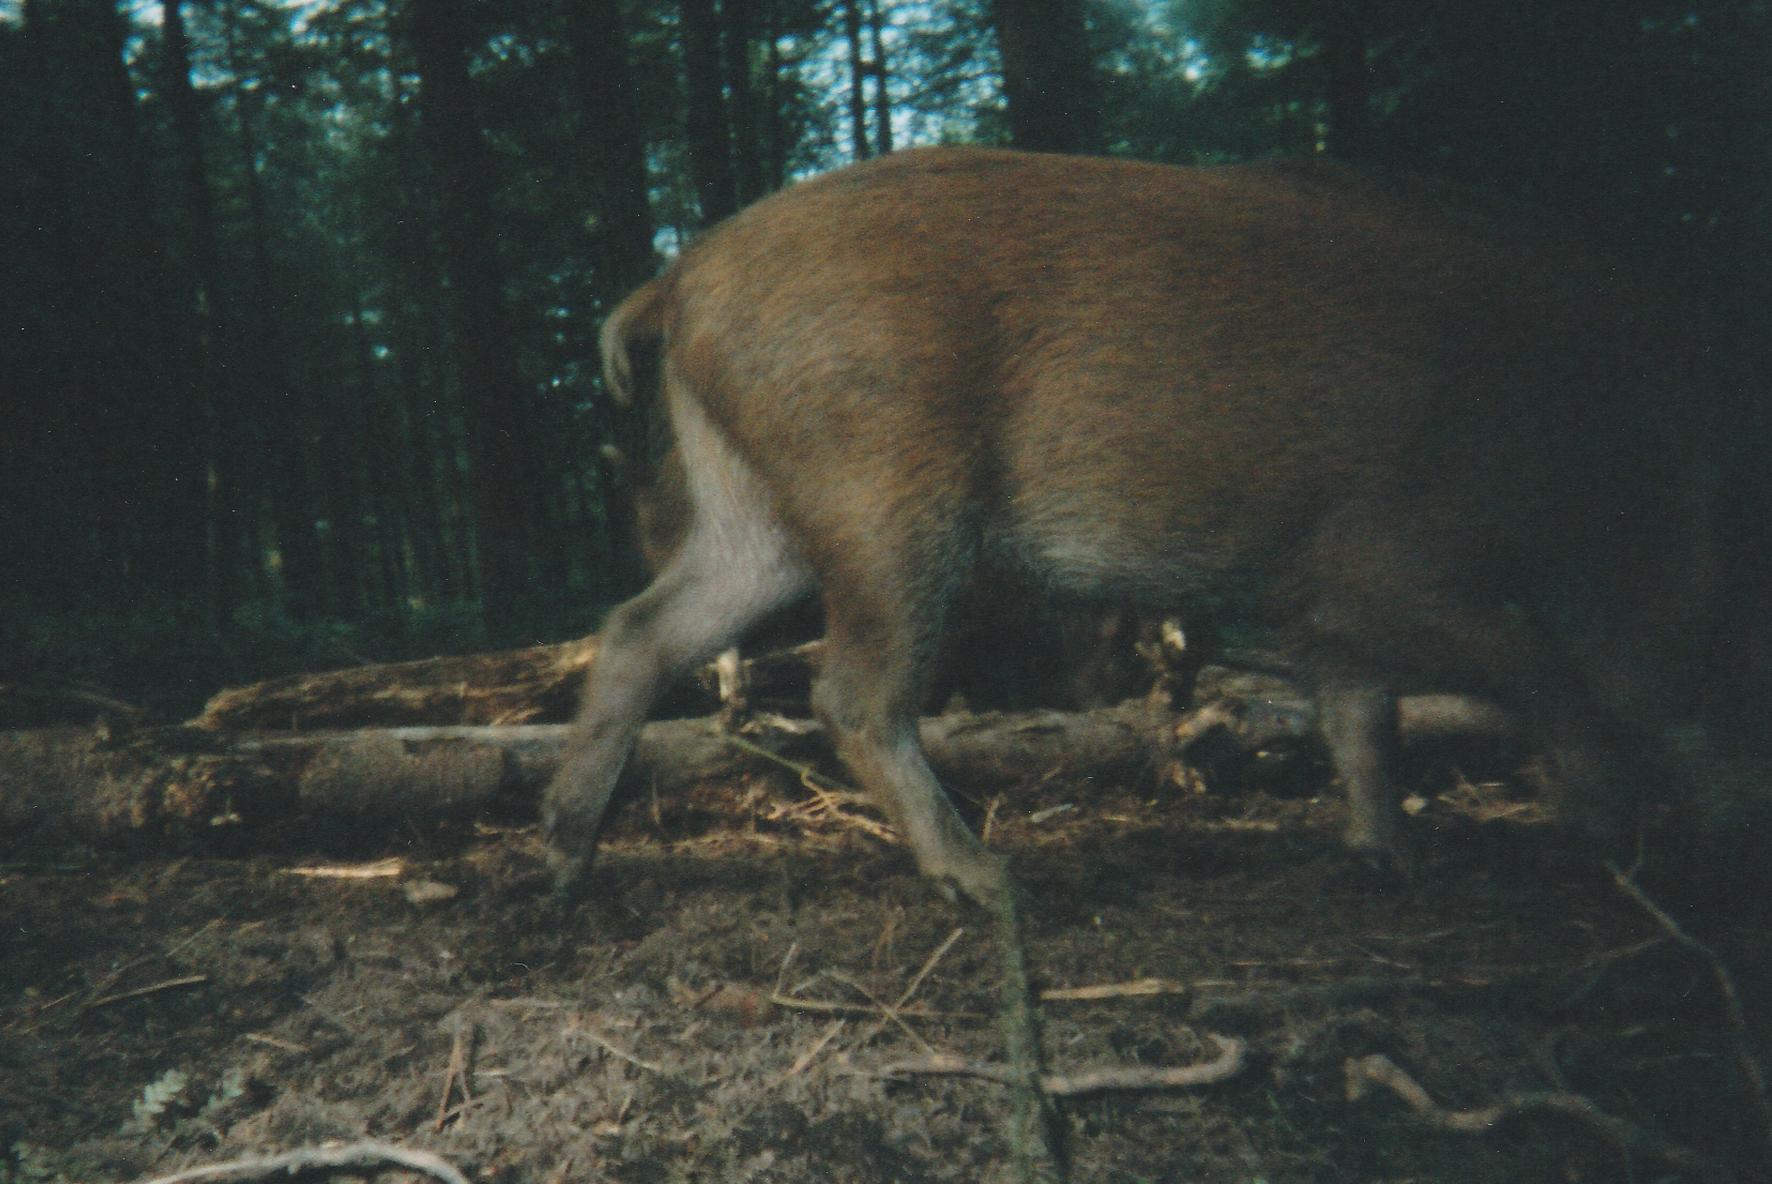 Wild Boar Photos 19.jpg